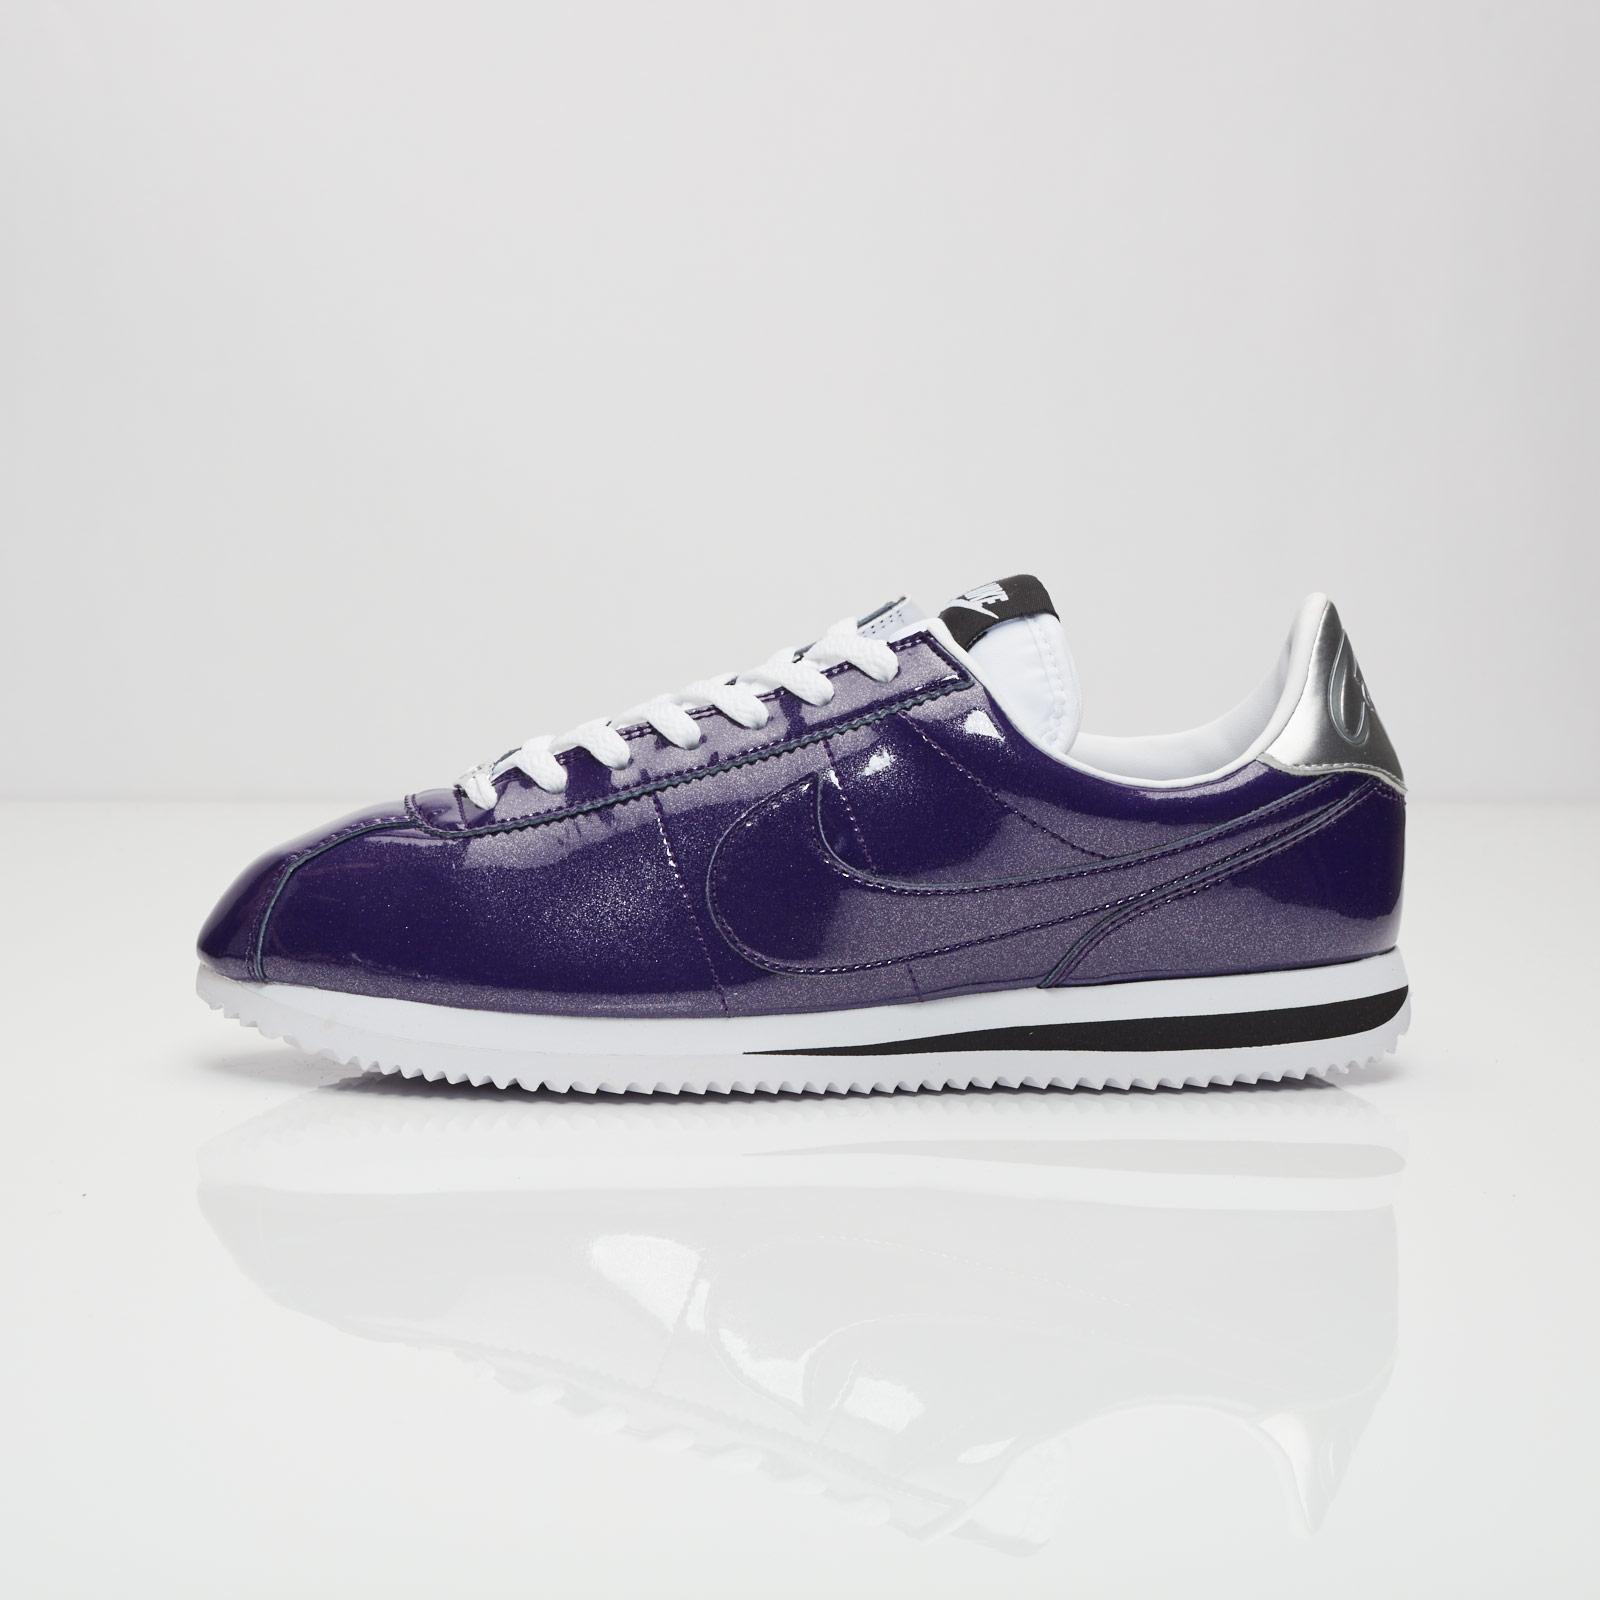 big sale f71a1 10fcf Nike Cortez Basic Premium QS - 819721-500 - Sneakersnstuff   sneakers    streetwear på nätet sen 1999